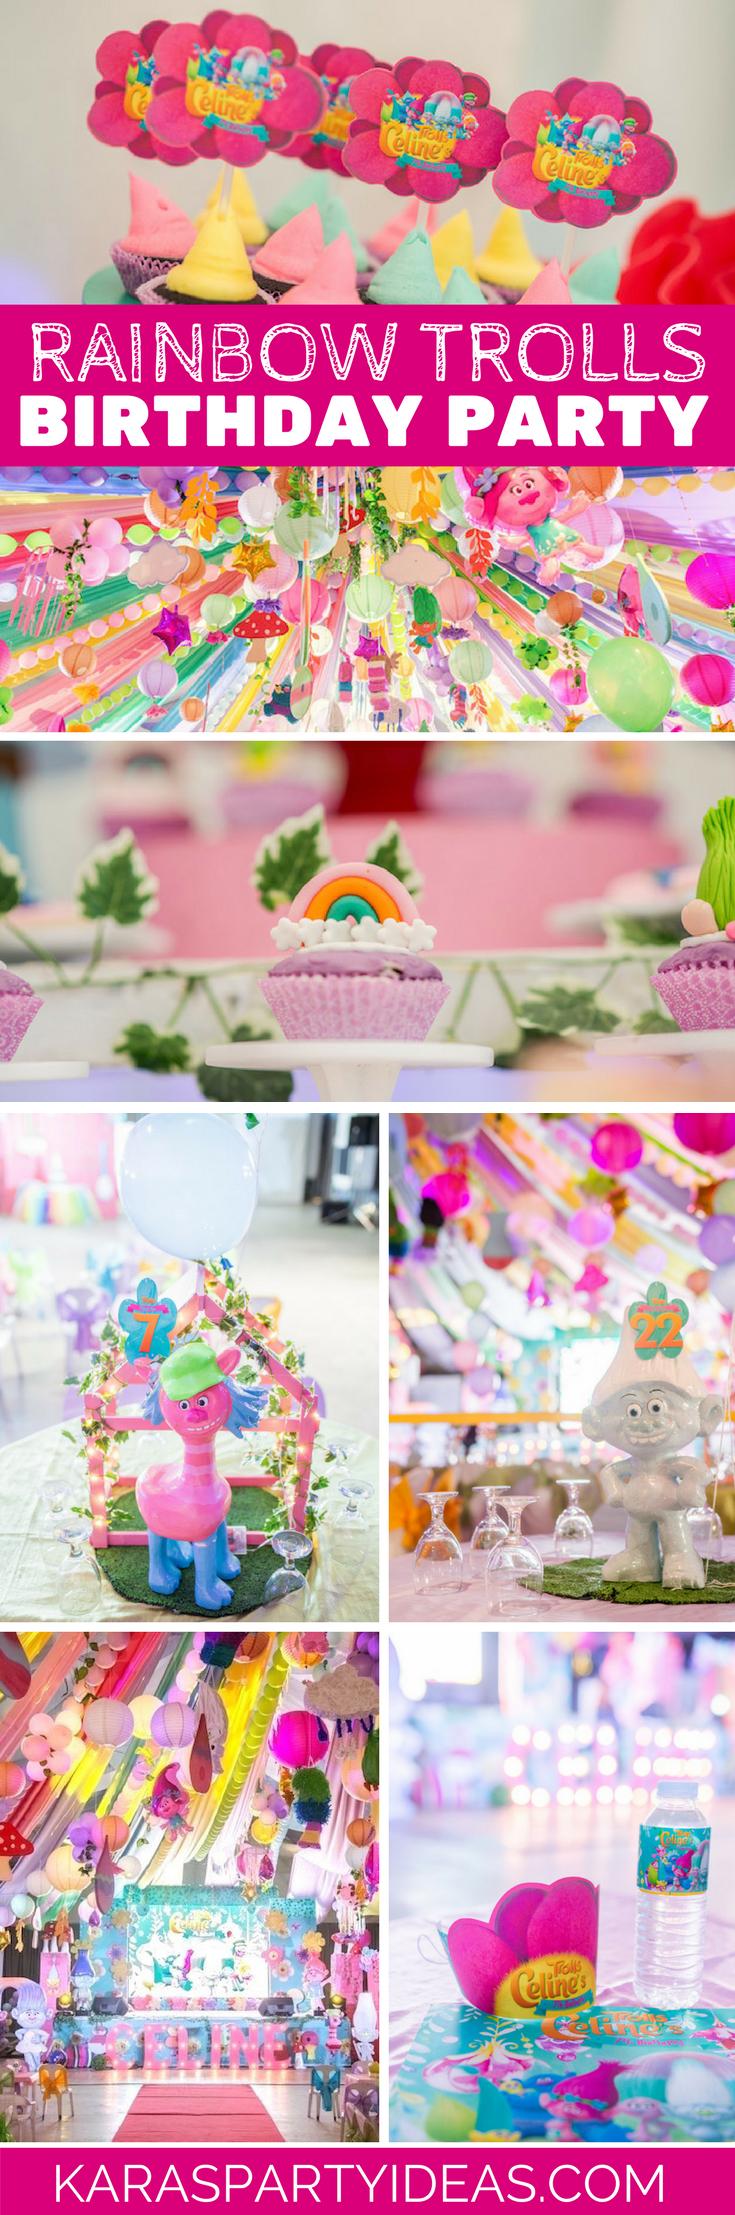 Large Of Trolls Birthday Party Ideas